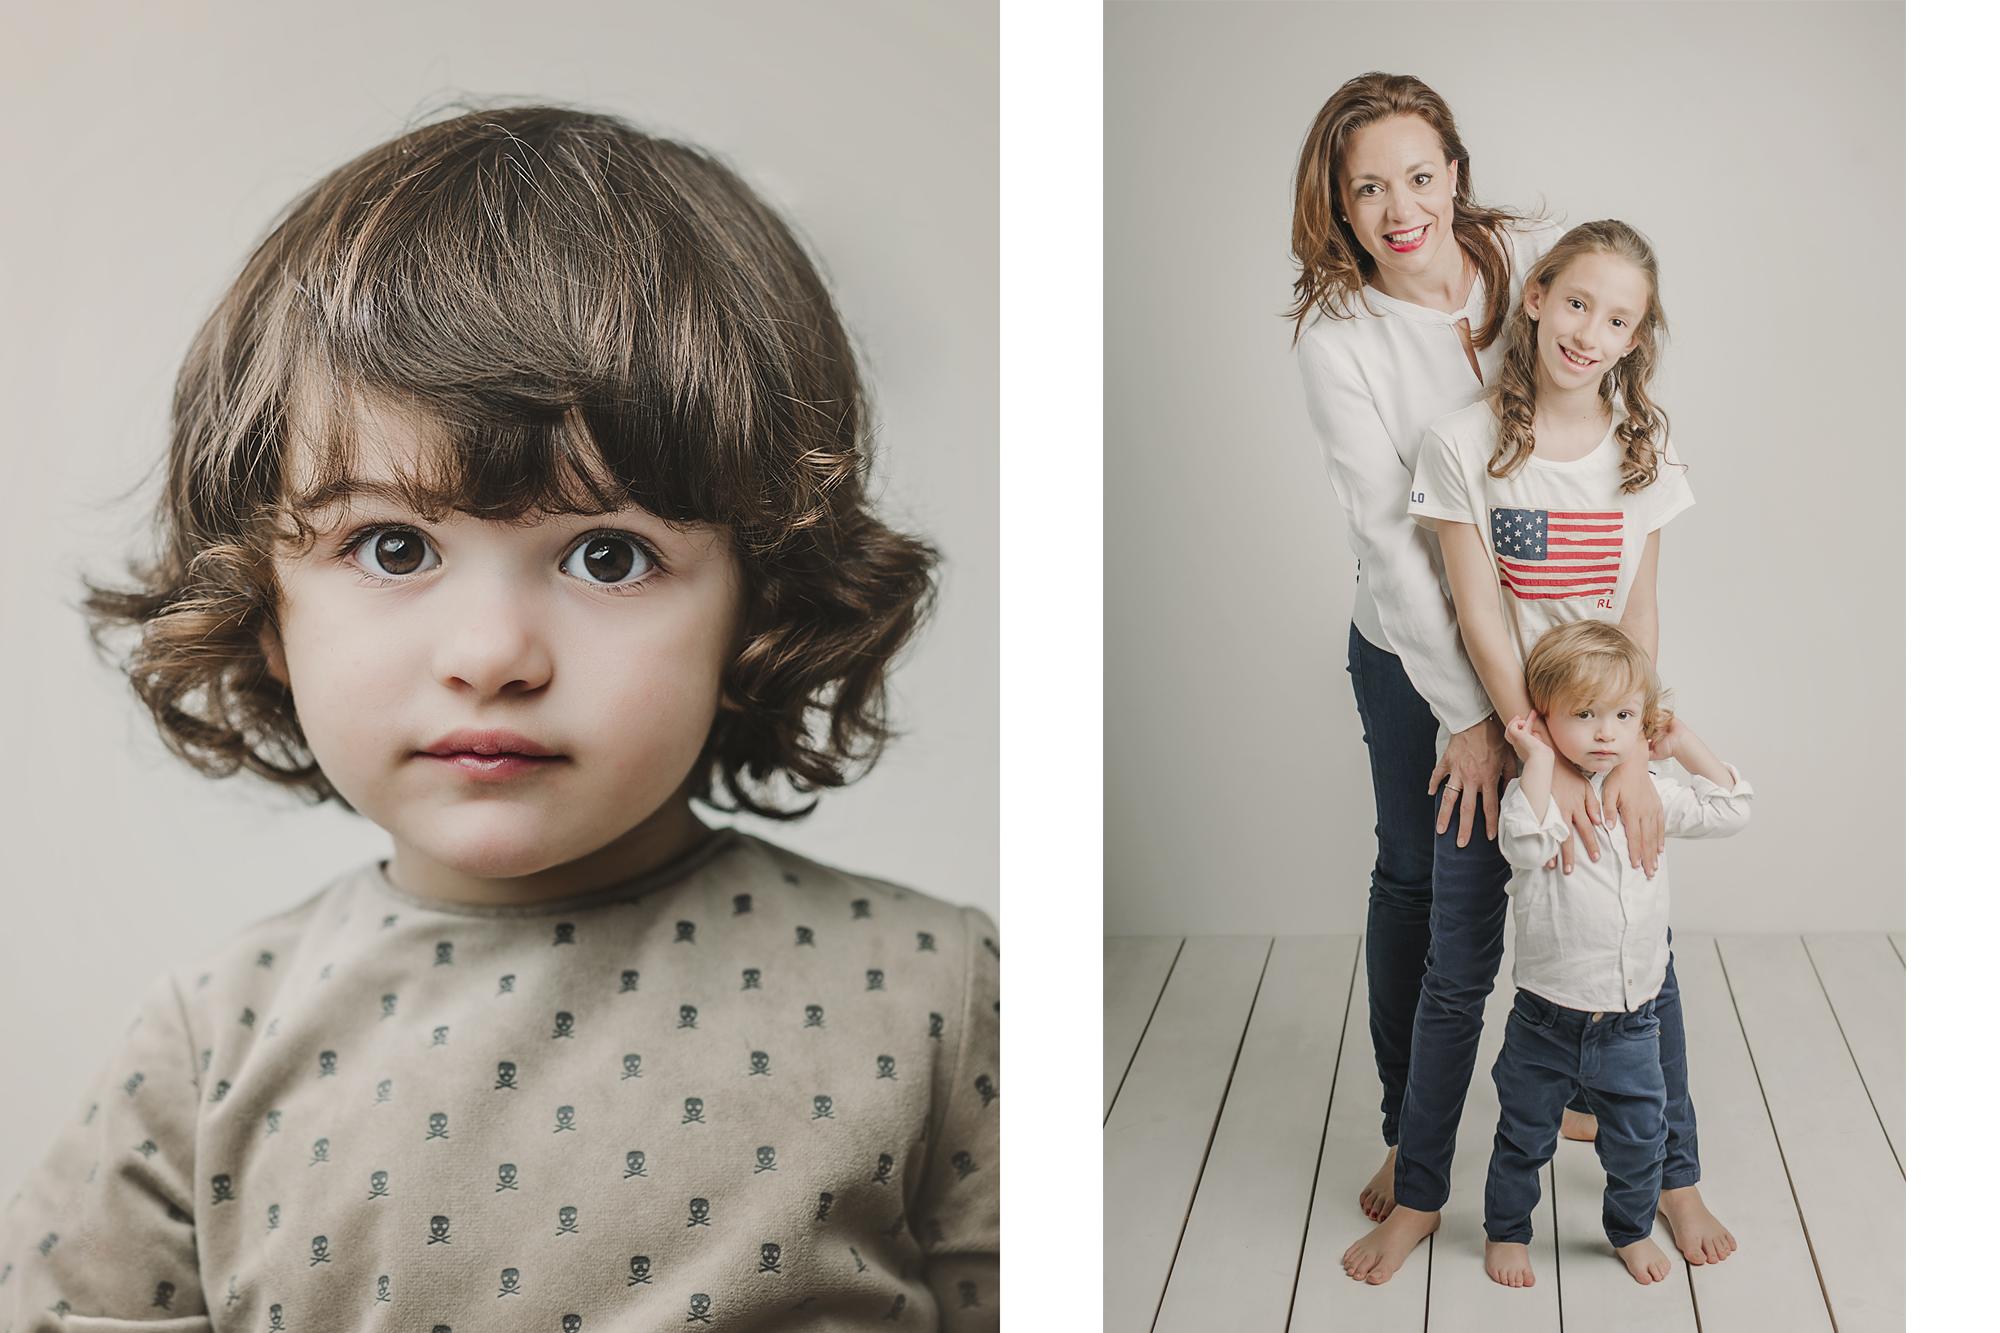 familia, fotos de familia en estudio,fotos de familia en exterior, el día de la madre, el día del padre